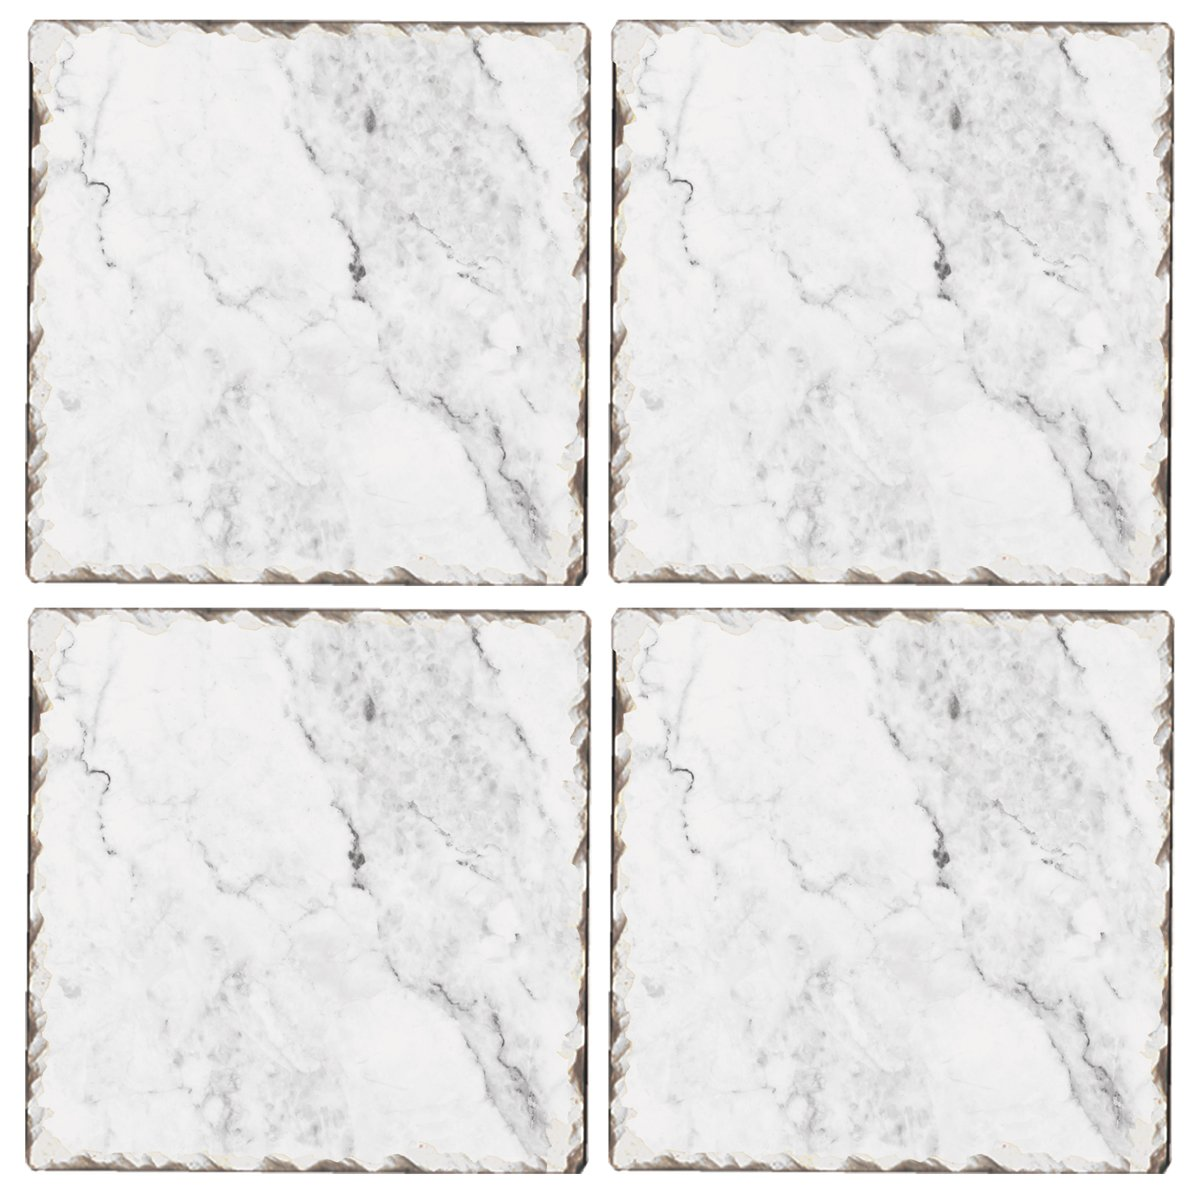 Cala Home Set of 4 Tumbled Tile Coasters, White Marble Pattern